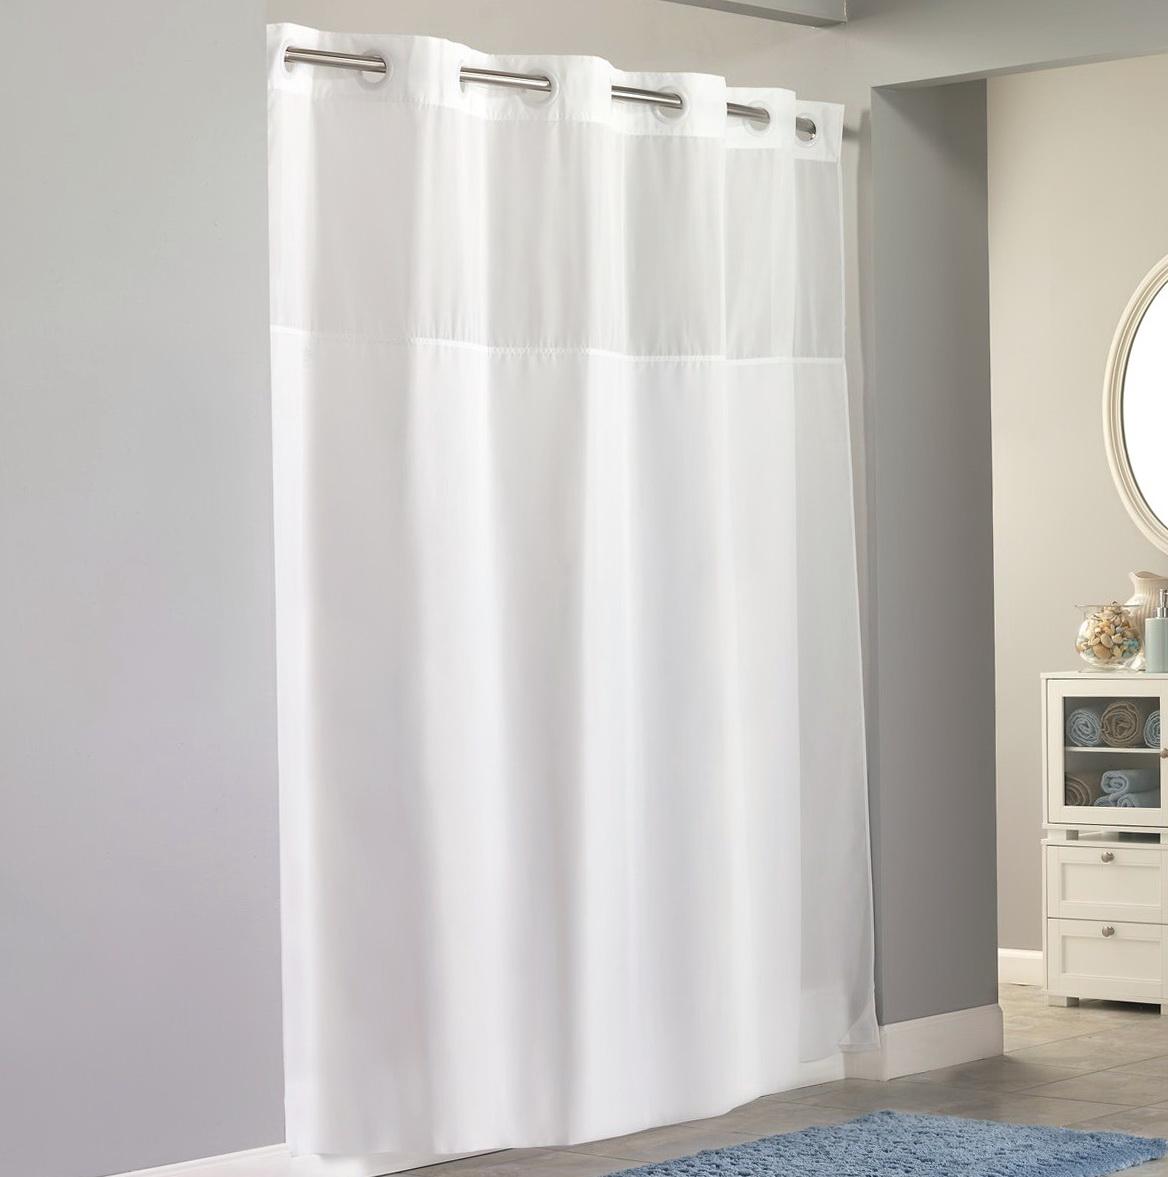 Hookless Fabric Shower Curtain | Home Design Ideas